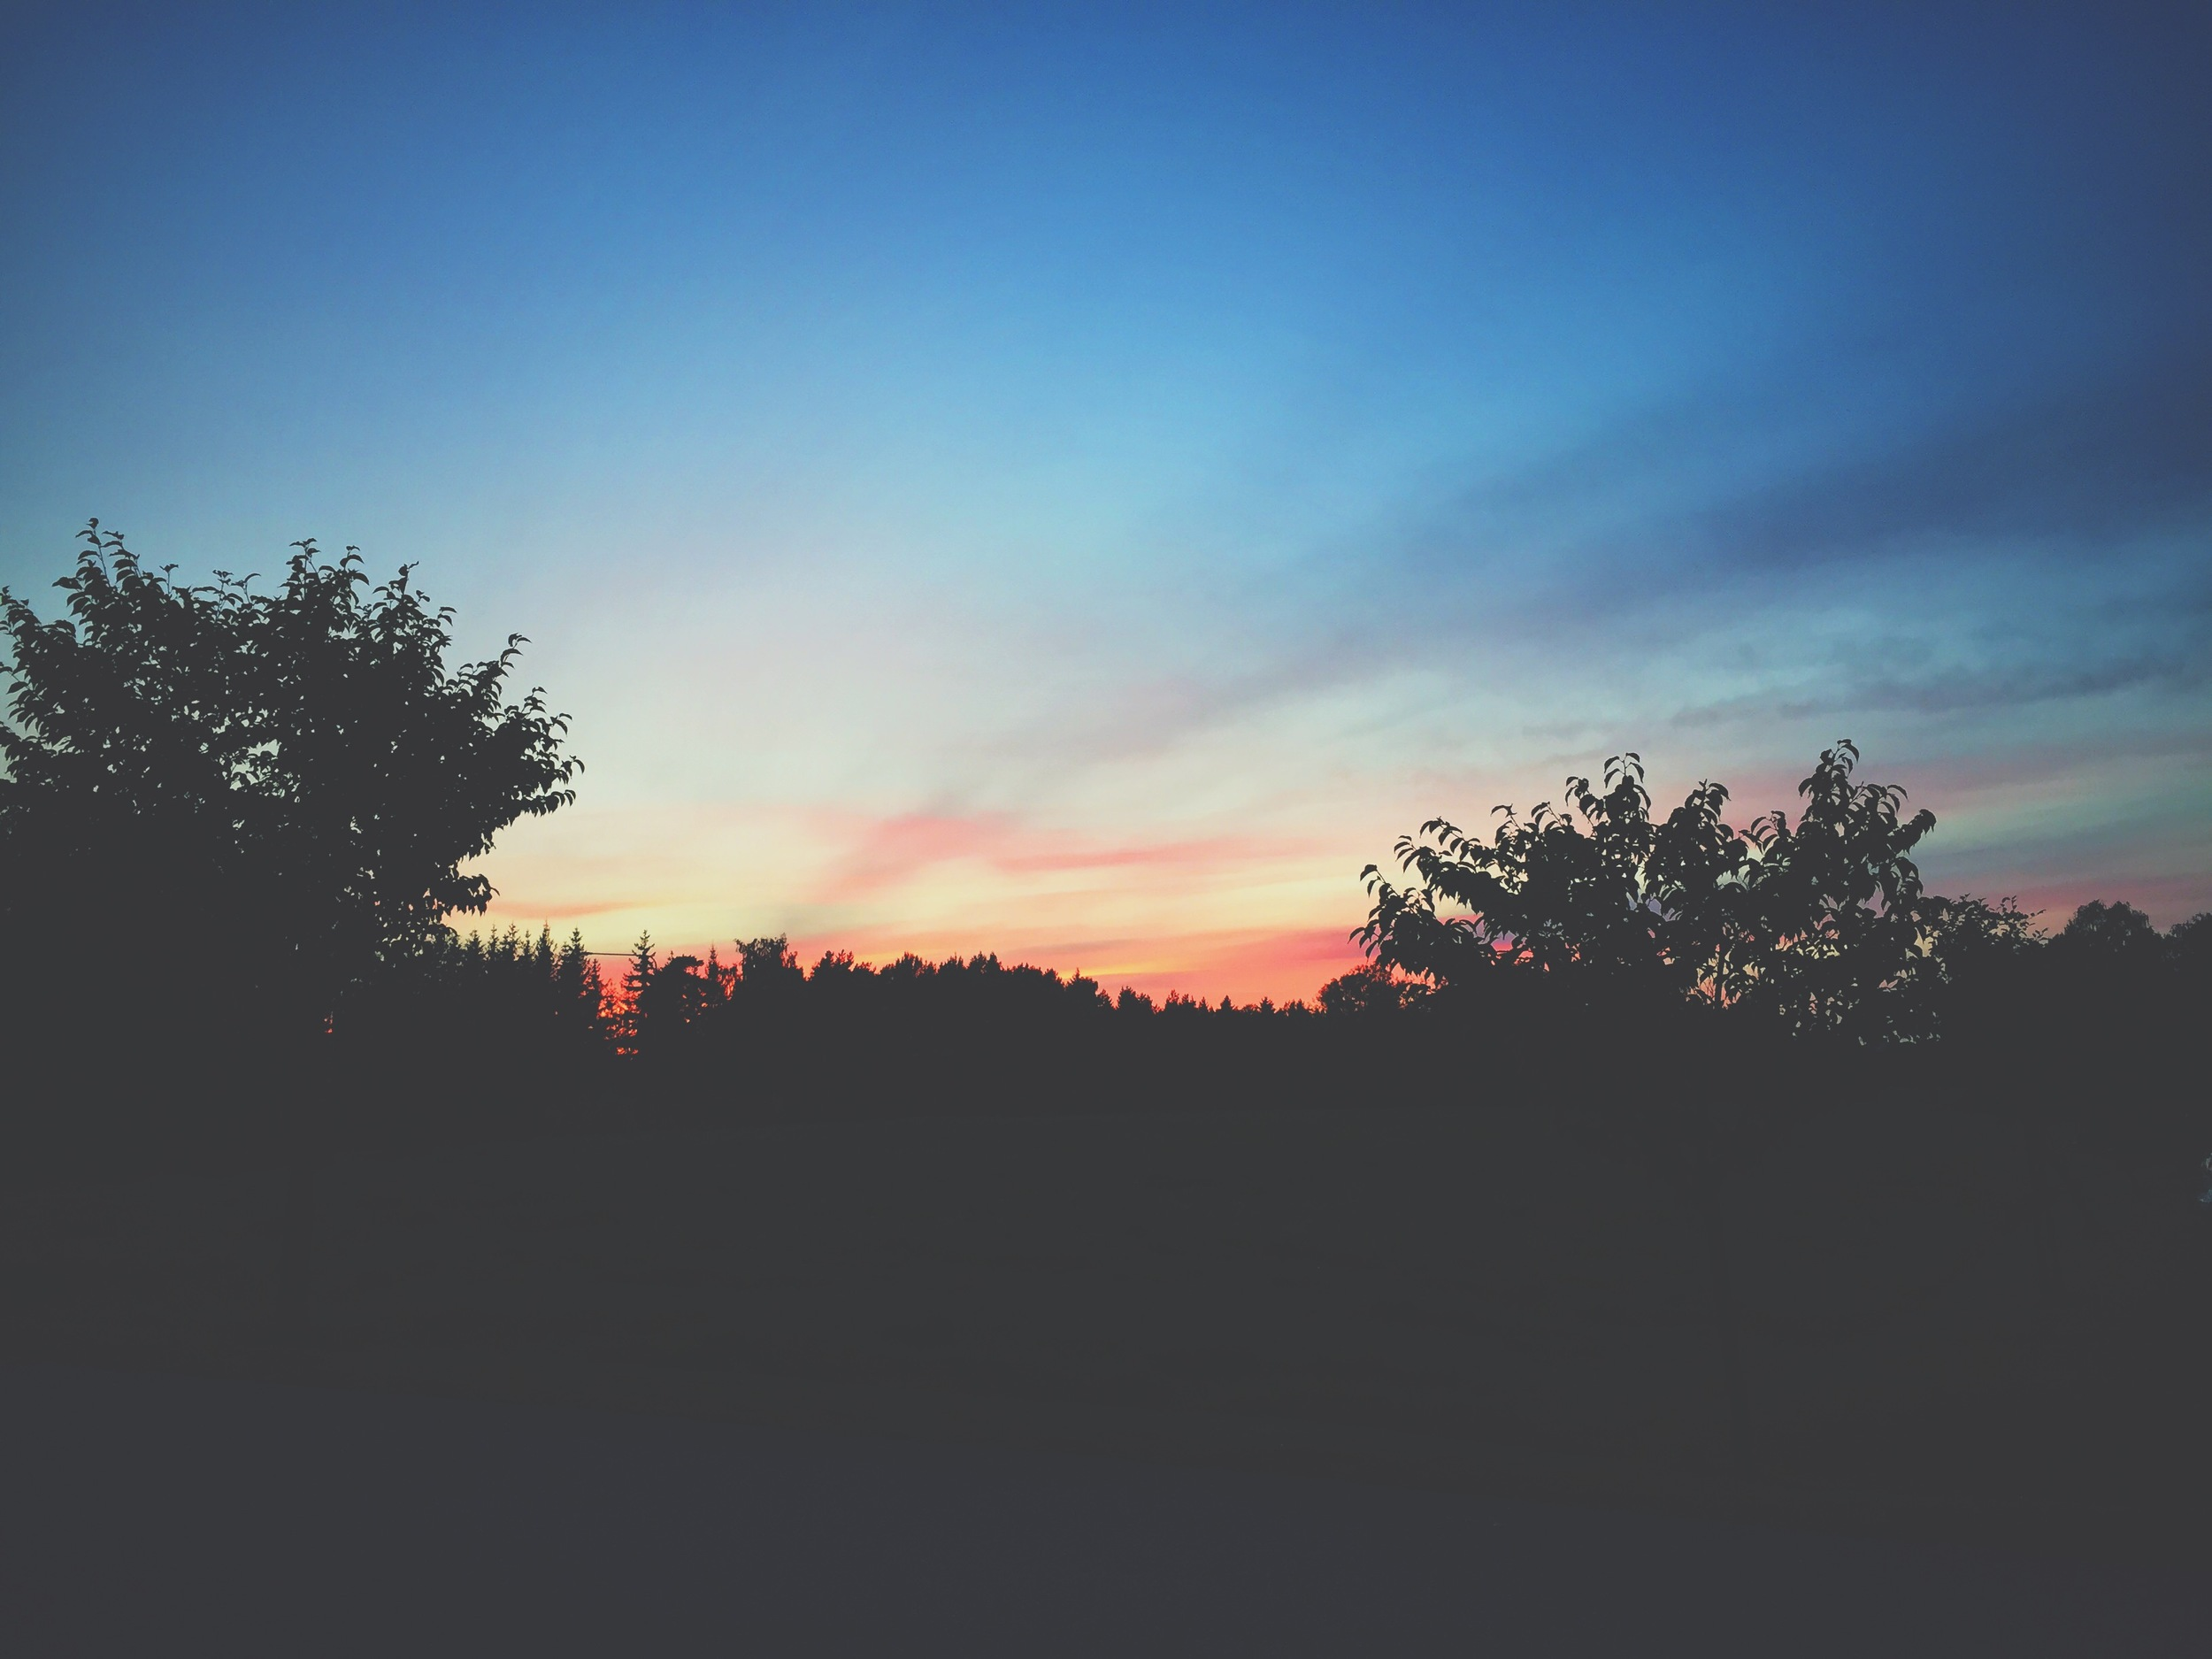 Another pretty sunset at Lilla Sunnersta.